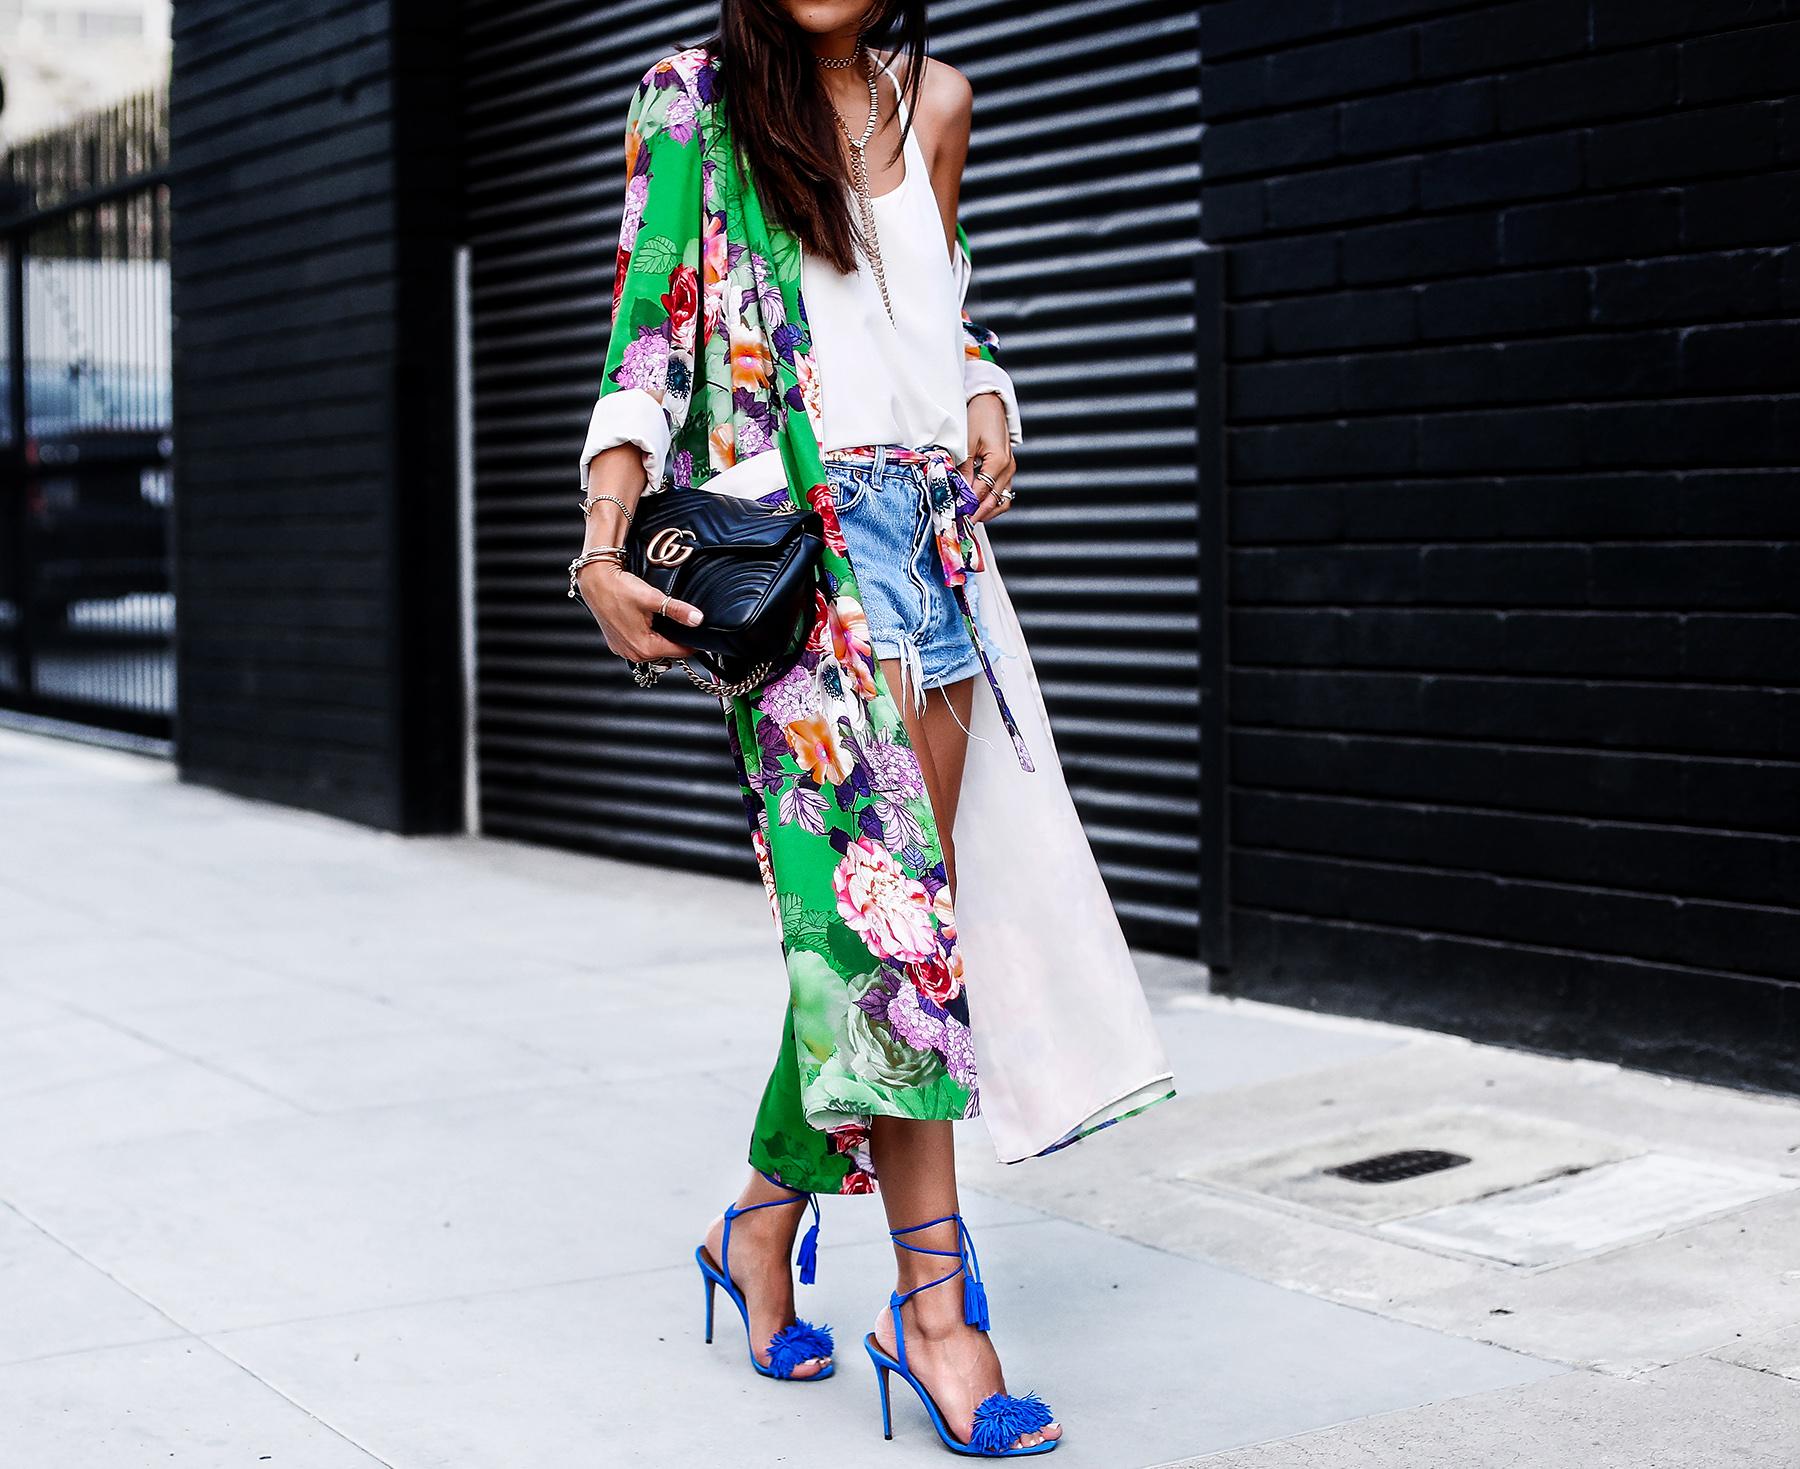 Kimono with Levis shorts Aquazzura Sandals gucci marmont bag.jpg